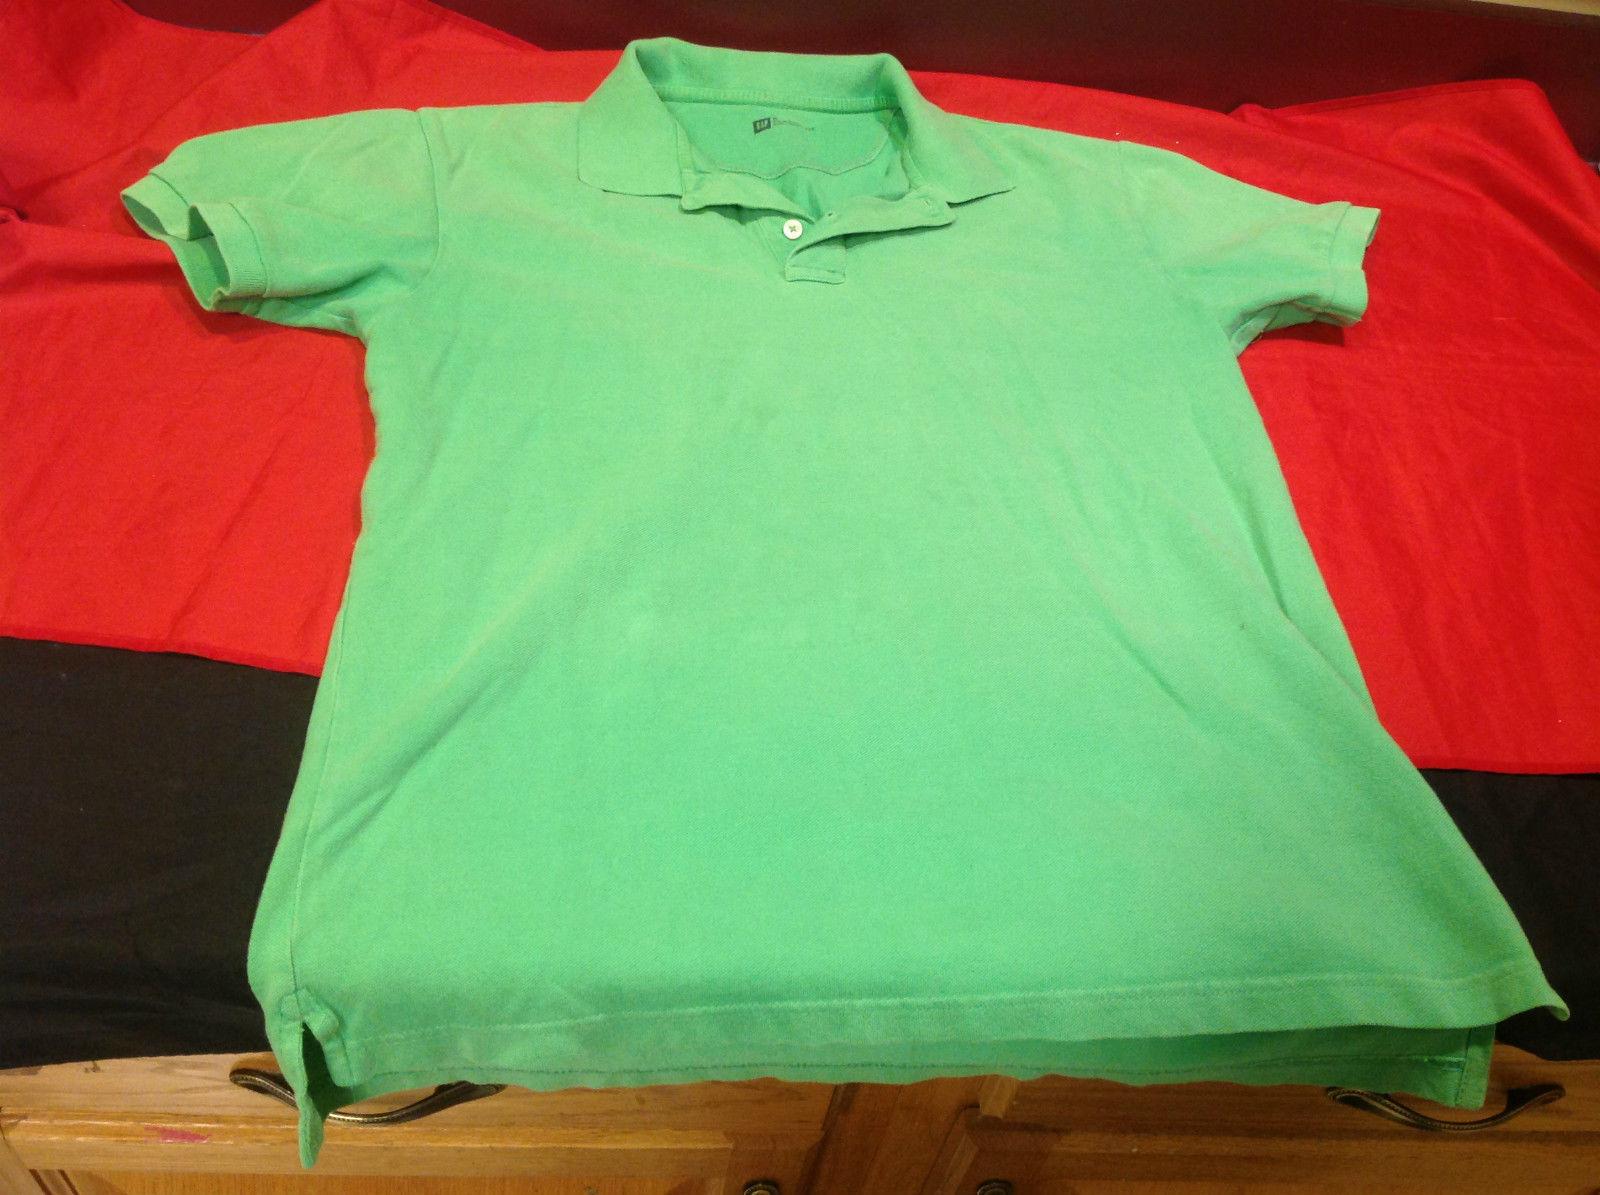 Gap Green/Lime Classic Fit Mens Short Sleeve Polo Shirt Size Medium image 2